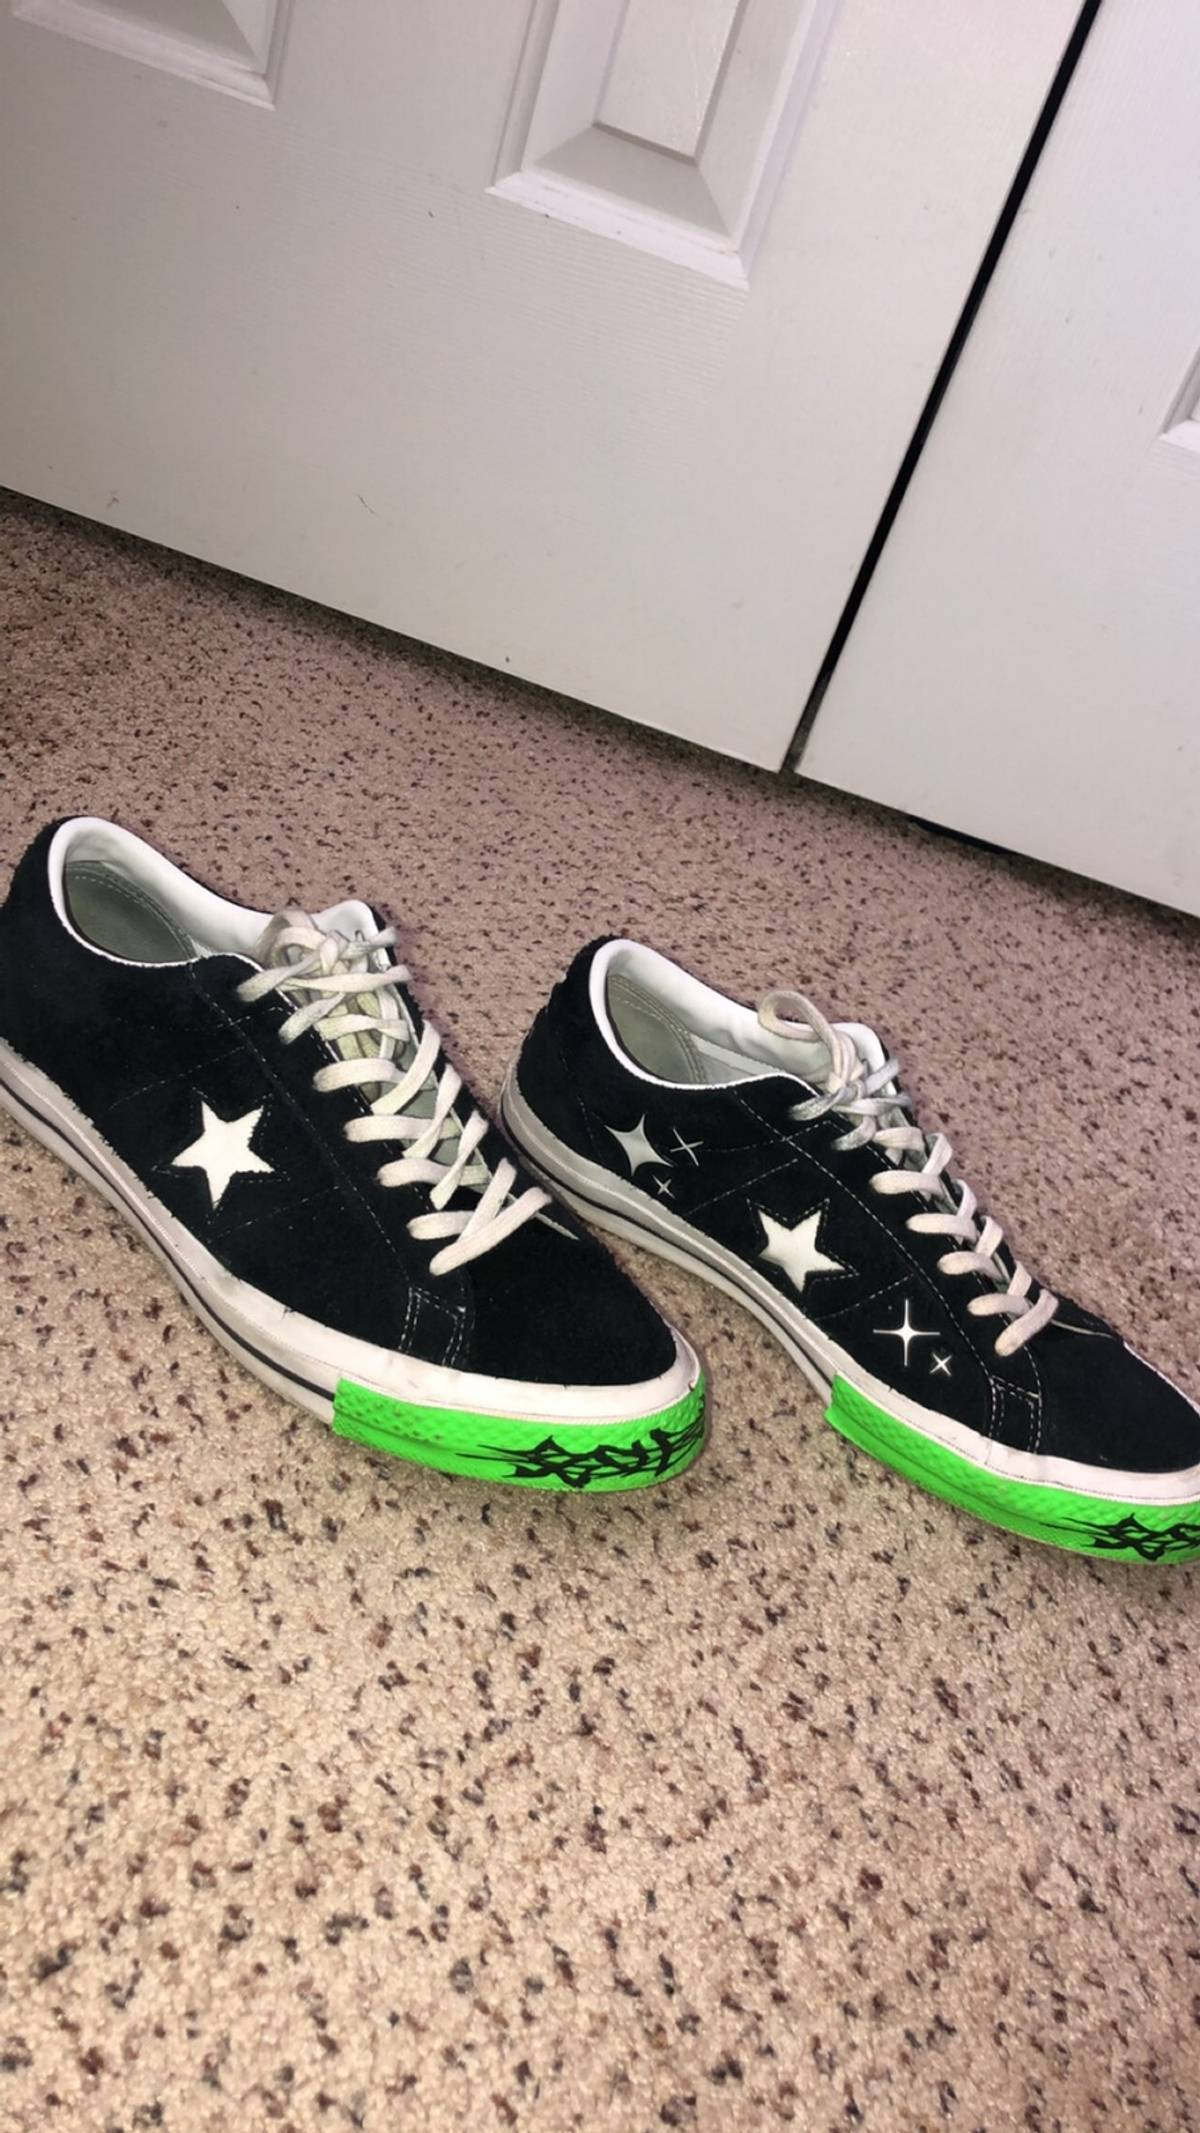 Converse × Sad Boys × Yung Lean Yung Lean Sad Boys Toxic One Stars Size 11 $342